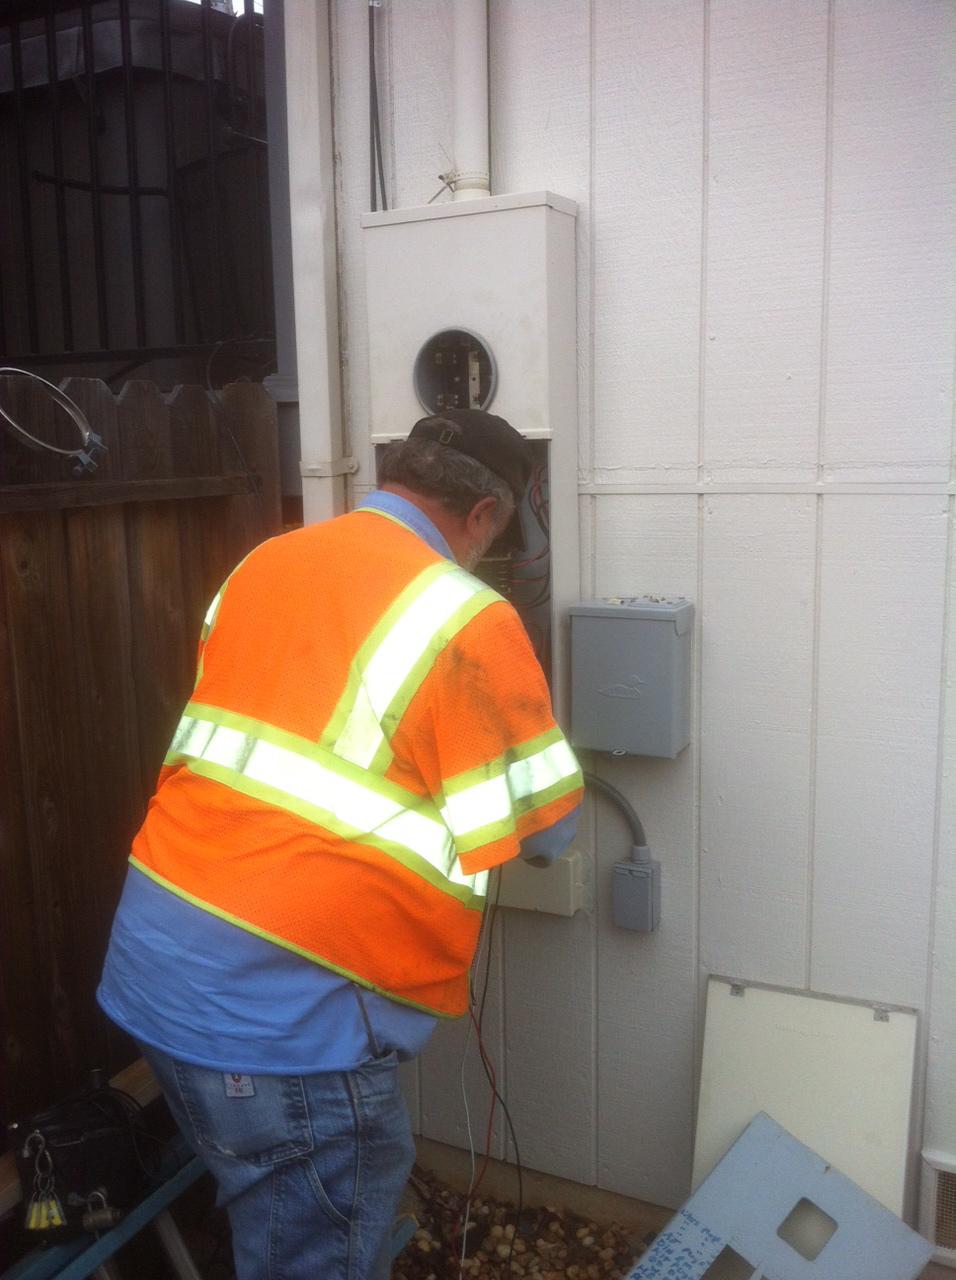 Fire Captain Finds Hazardous Power Surges Follow Smart Meter Wiring Jaw Shut Some